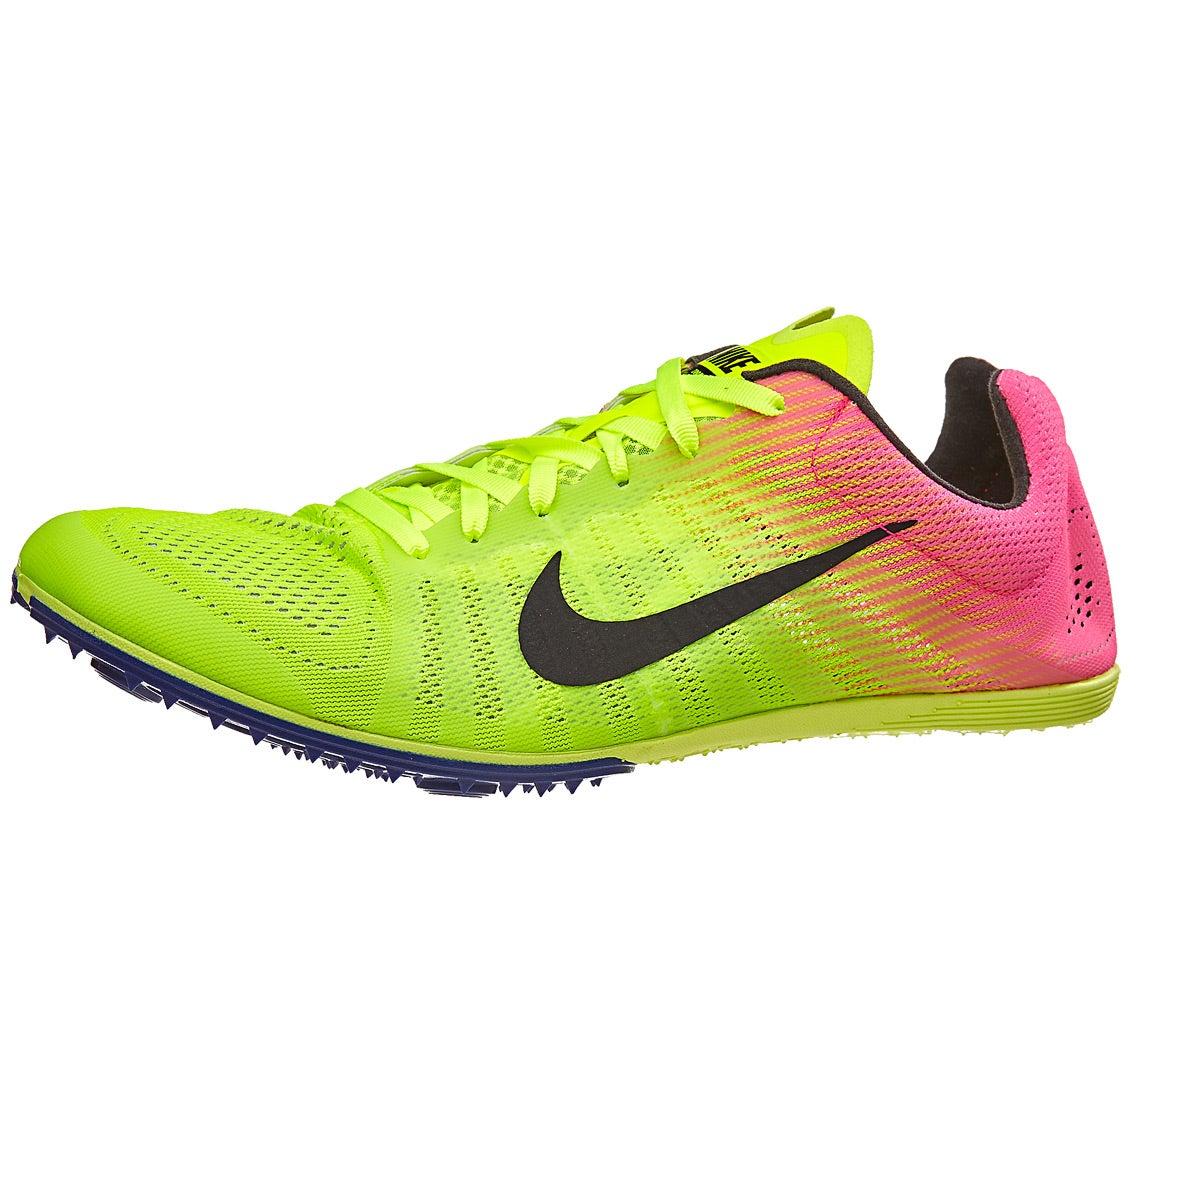 84e214ddc5b13b Nike Zoom D OC Unisex Spikes Multi-Color 360° View